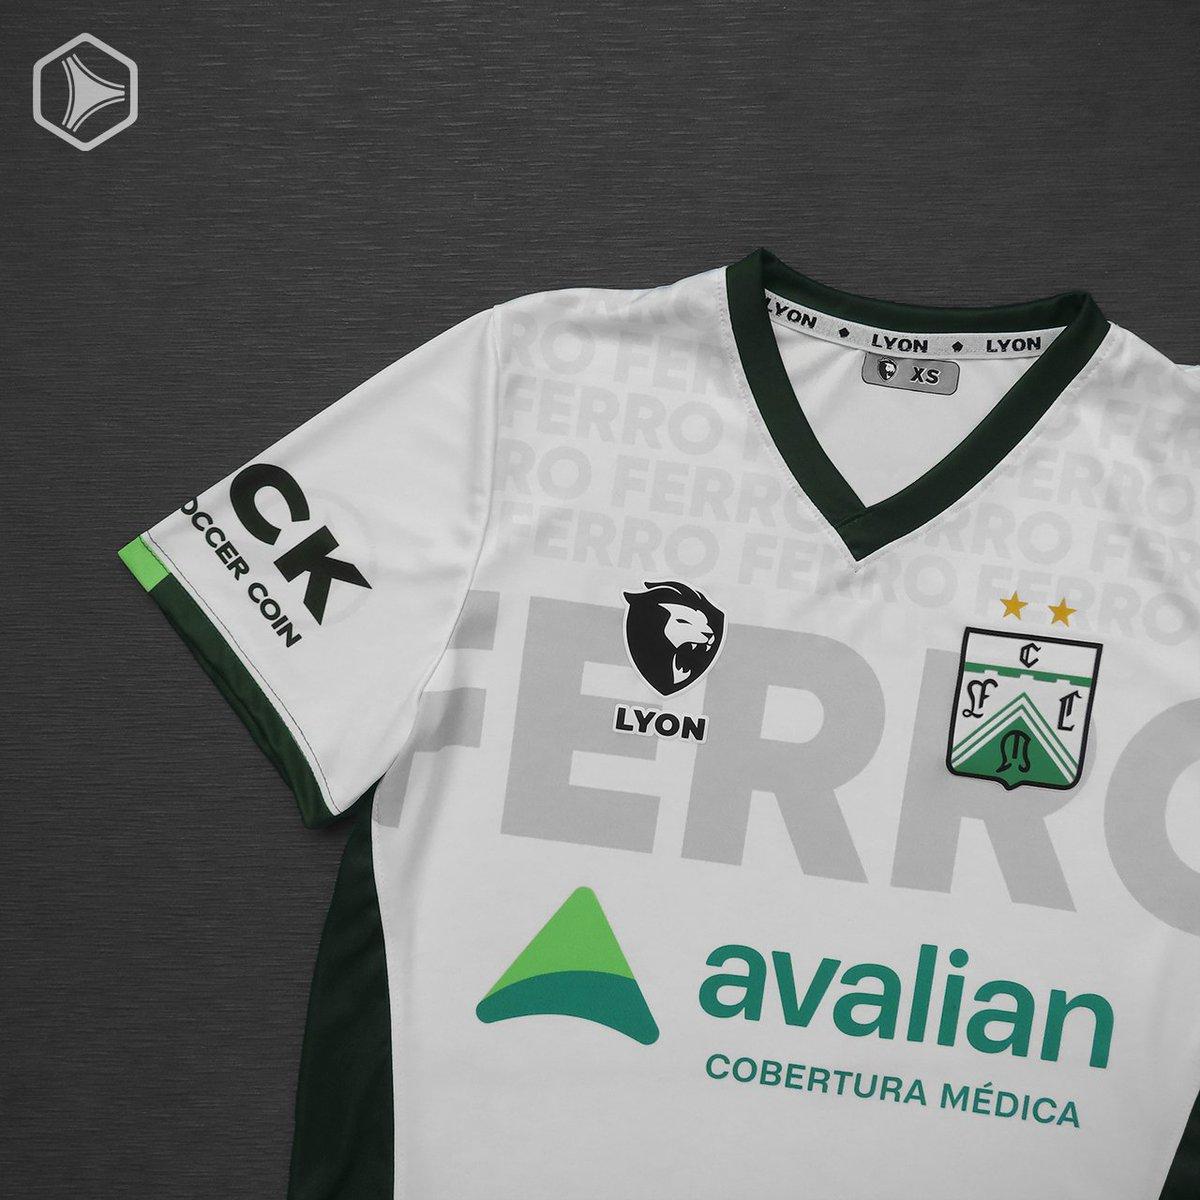 Camiseta Sport Lyon de Ferro Carril Oeste 2021